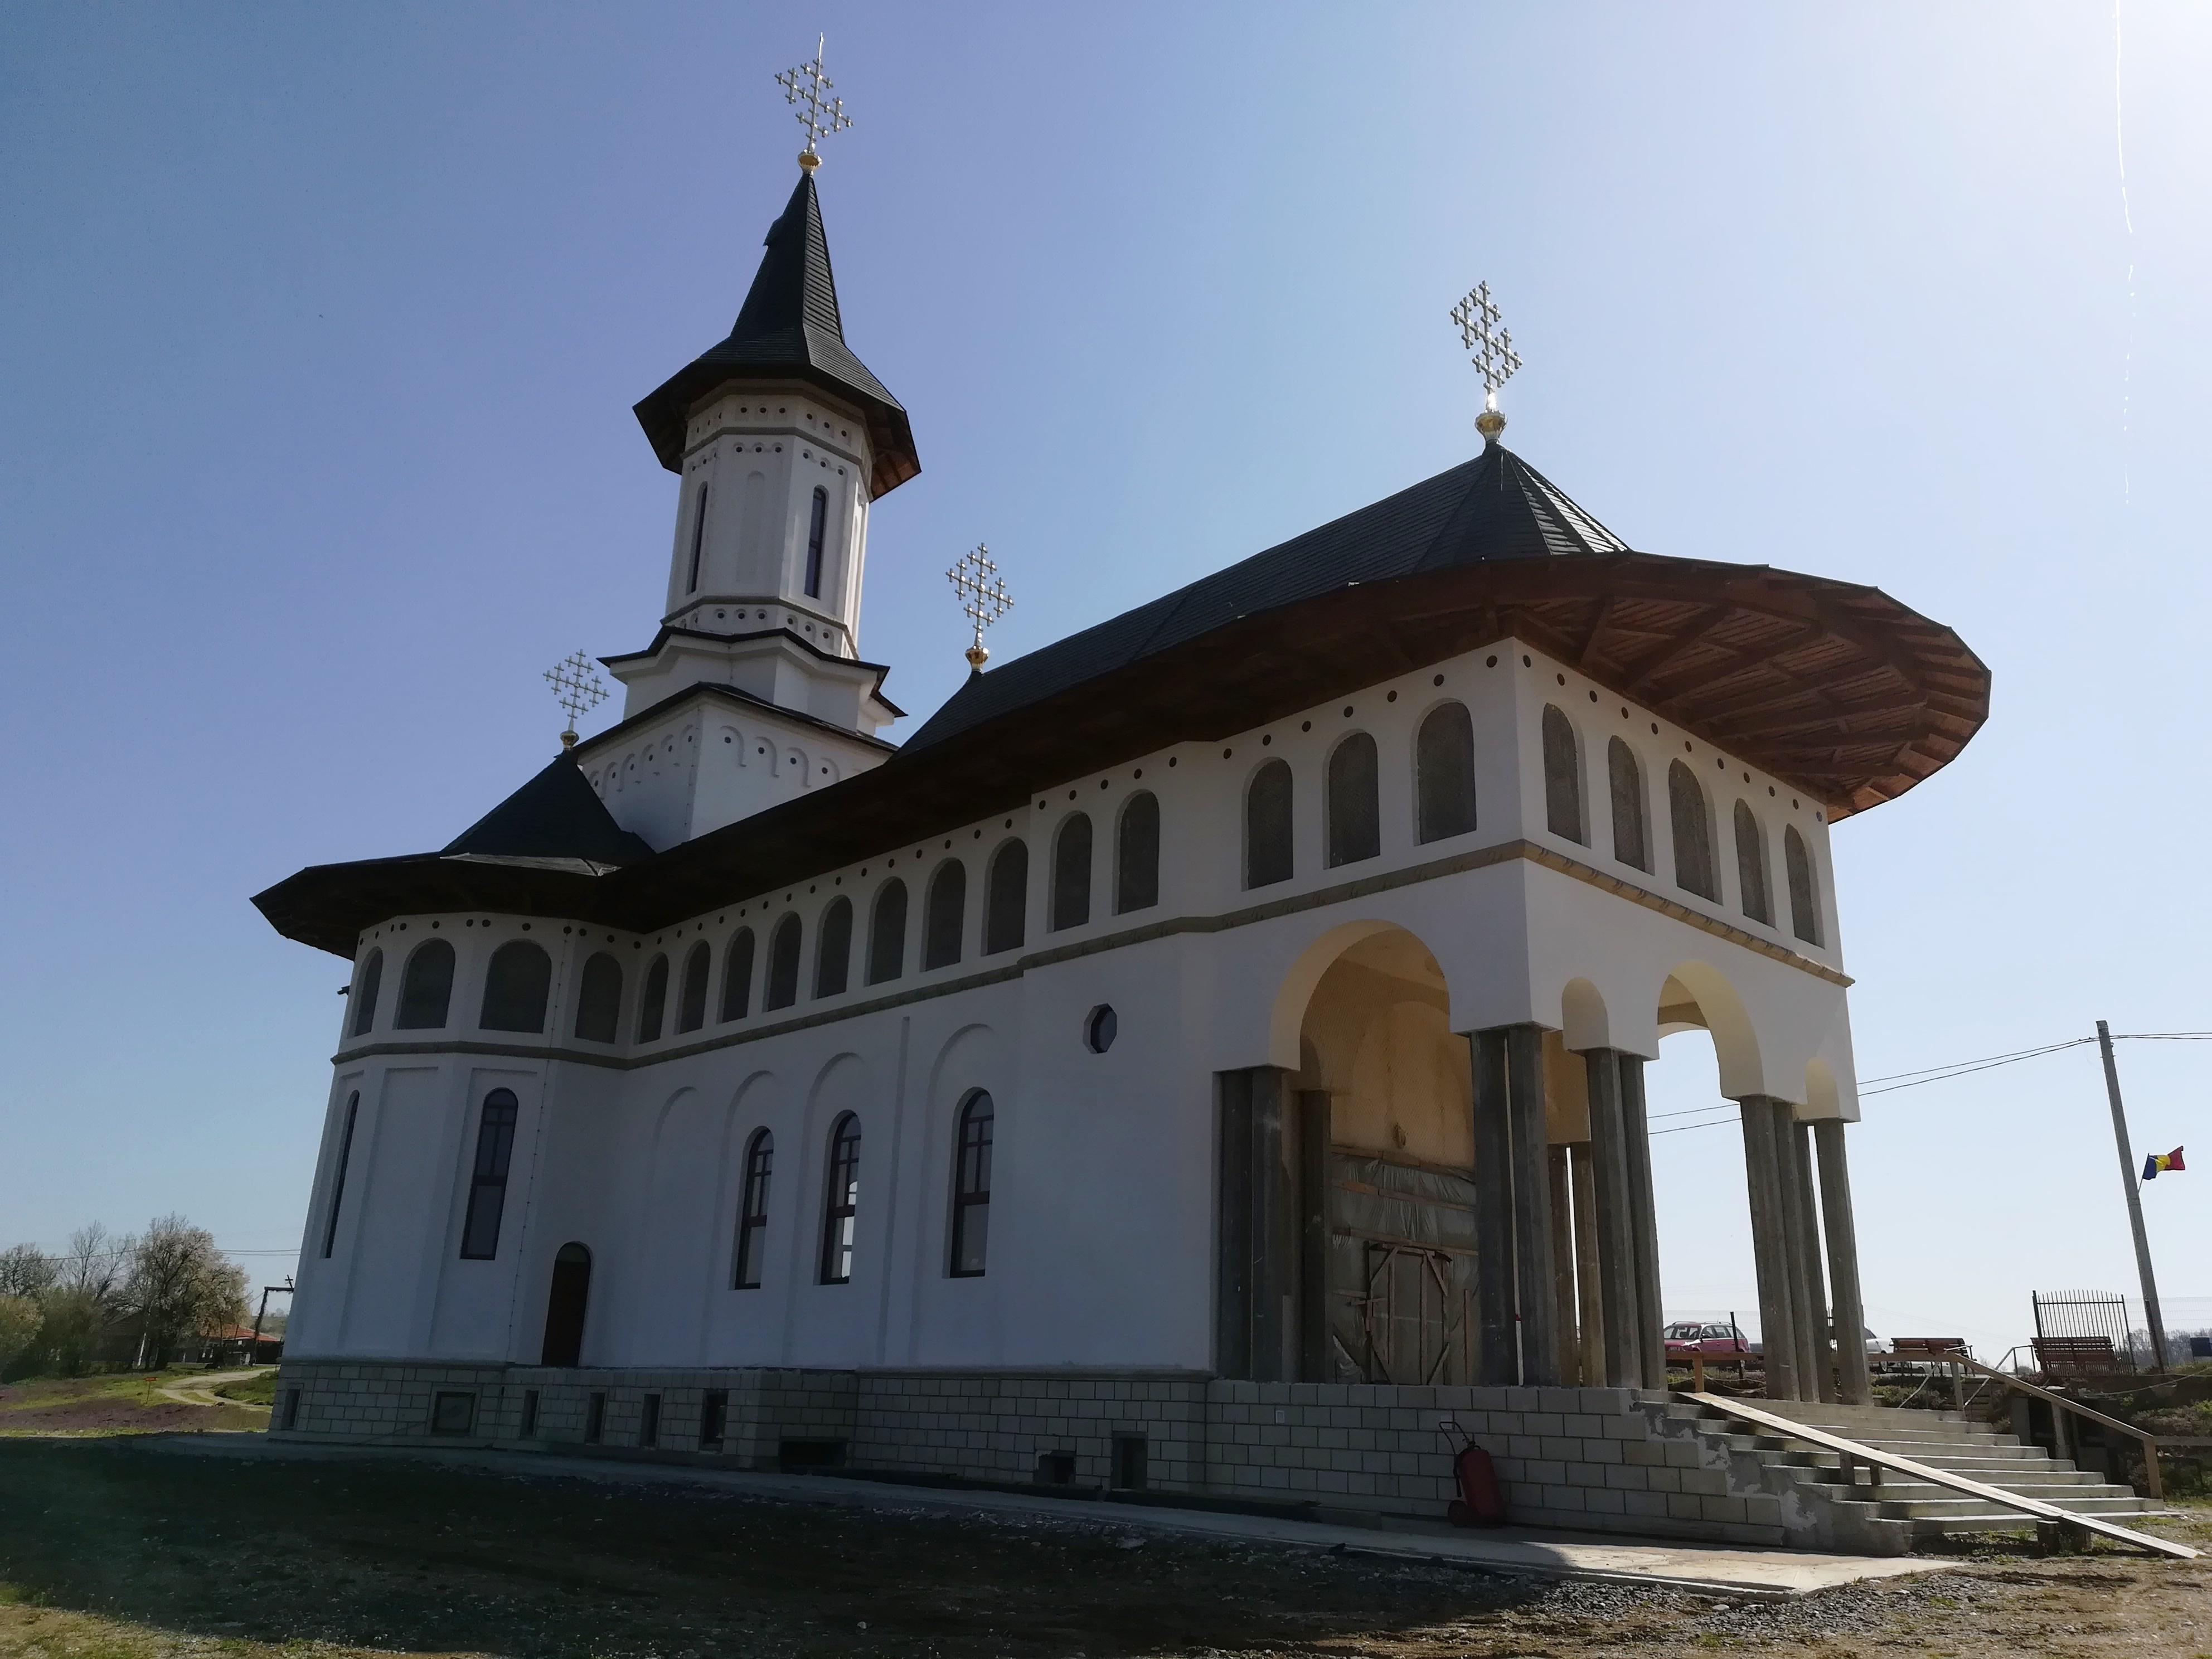 Manastirea de la Dobresti se apropie de finalizare